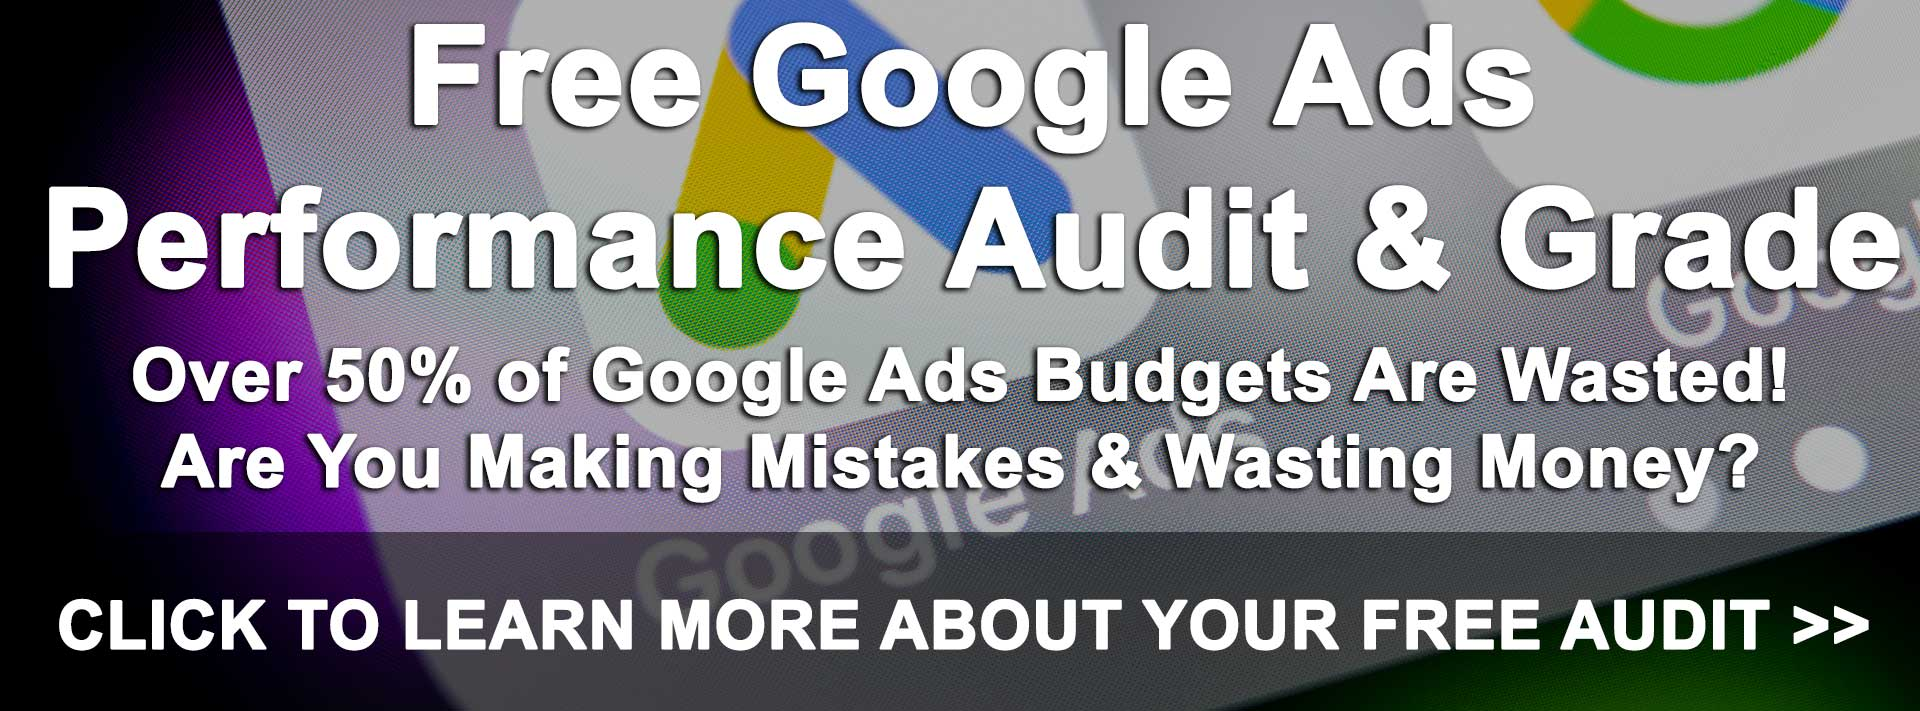 Free Google Ads Performance Audit & Grade